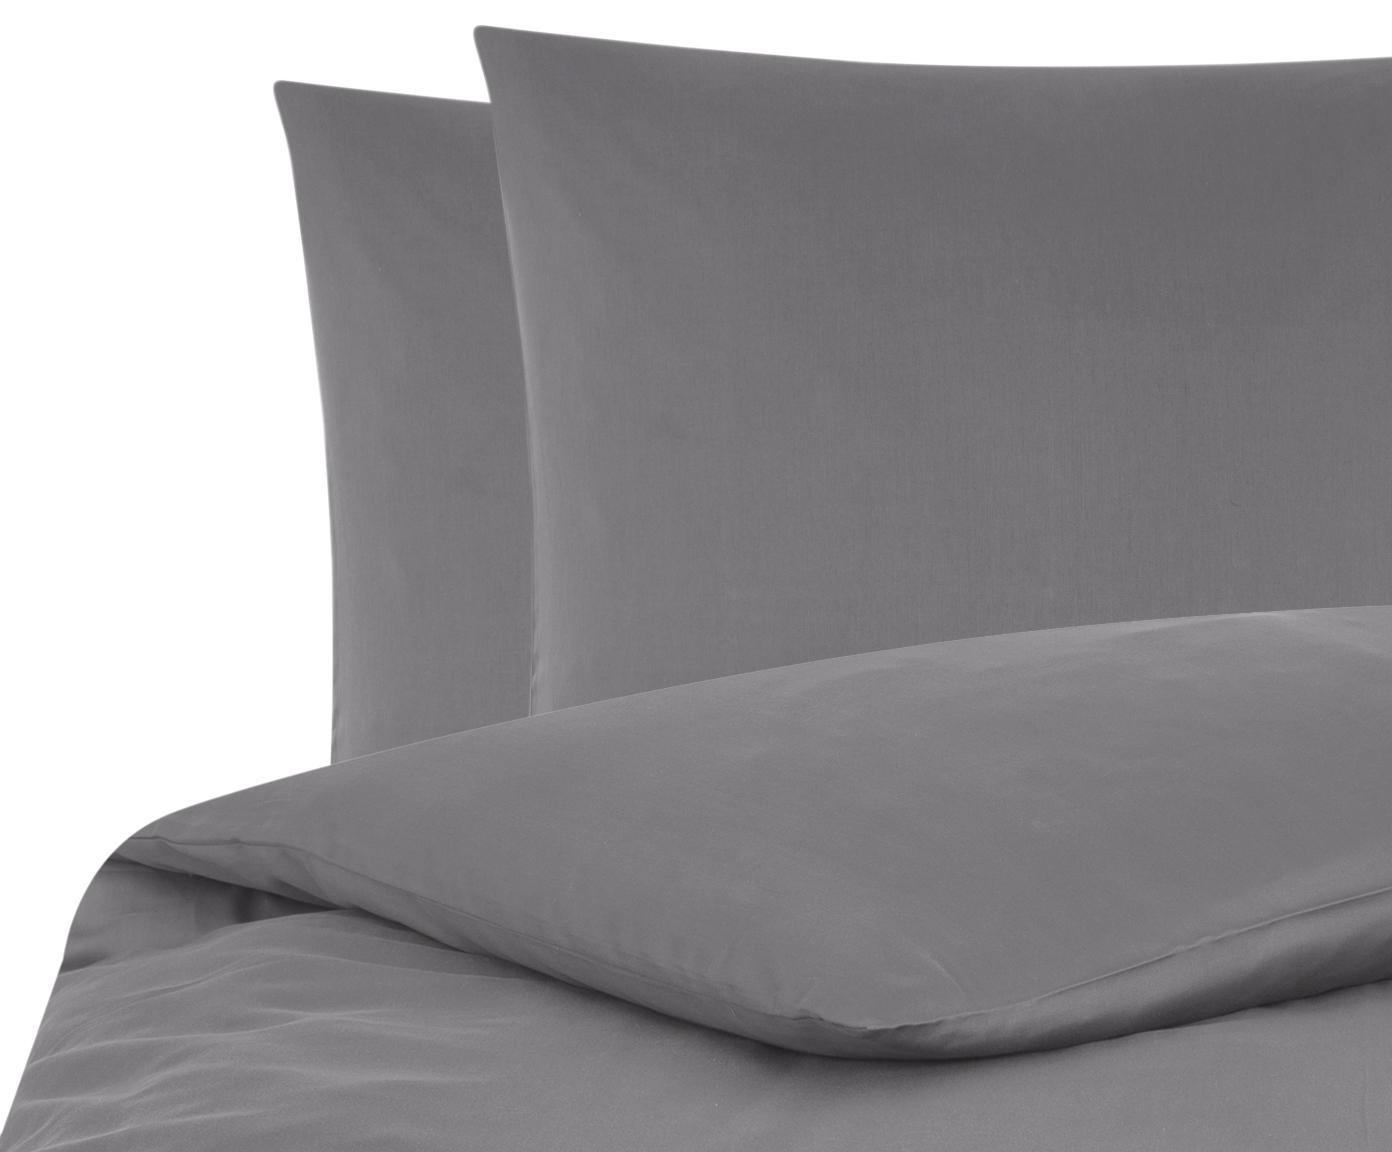 Baumwollsatin-Bettwäsche Comfort in Dunkelgrau, Webart: Satin Fadendichte 250 TC,, Dunkelgrau, 200 x 200 cm + 2 Kissen 80 x 80 cm